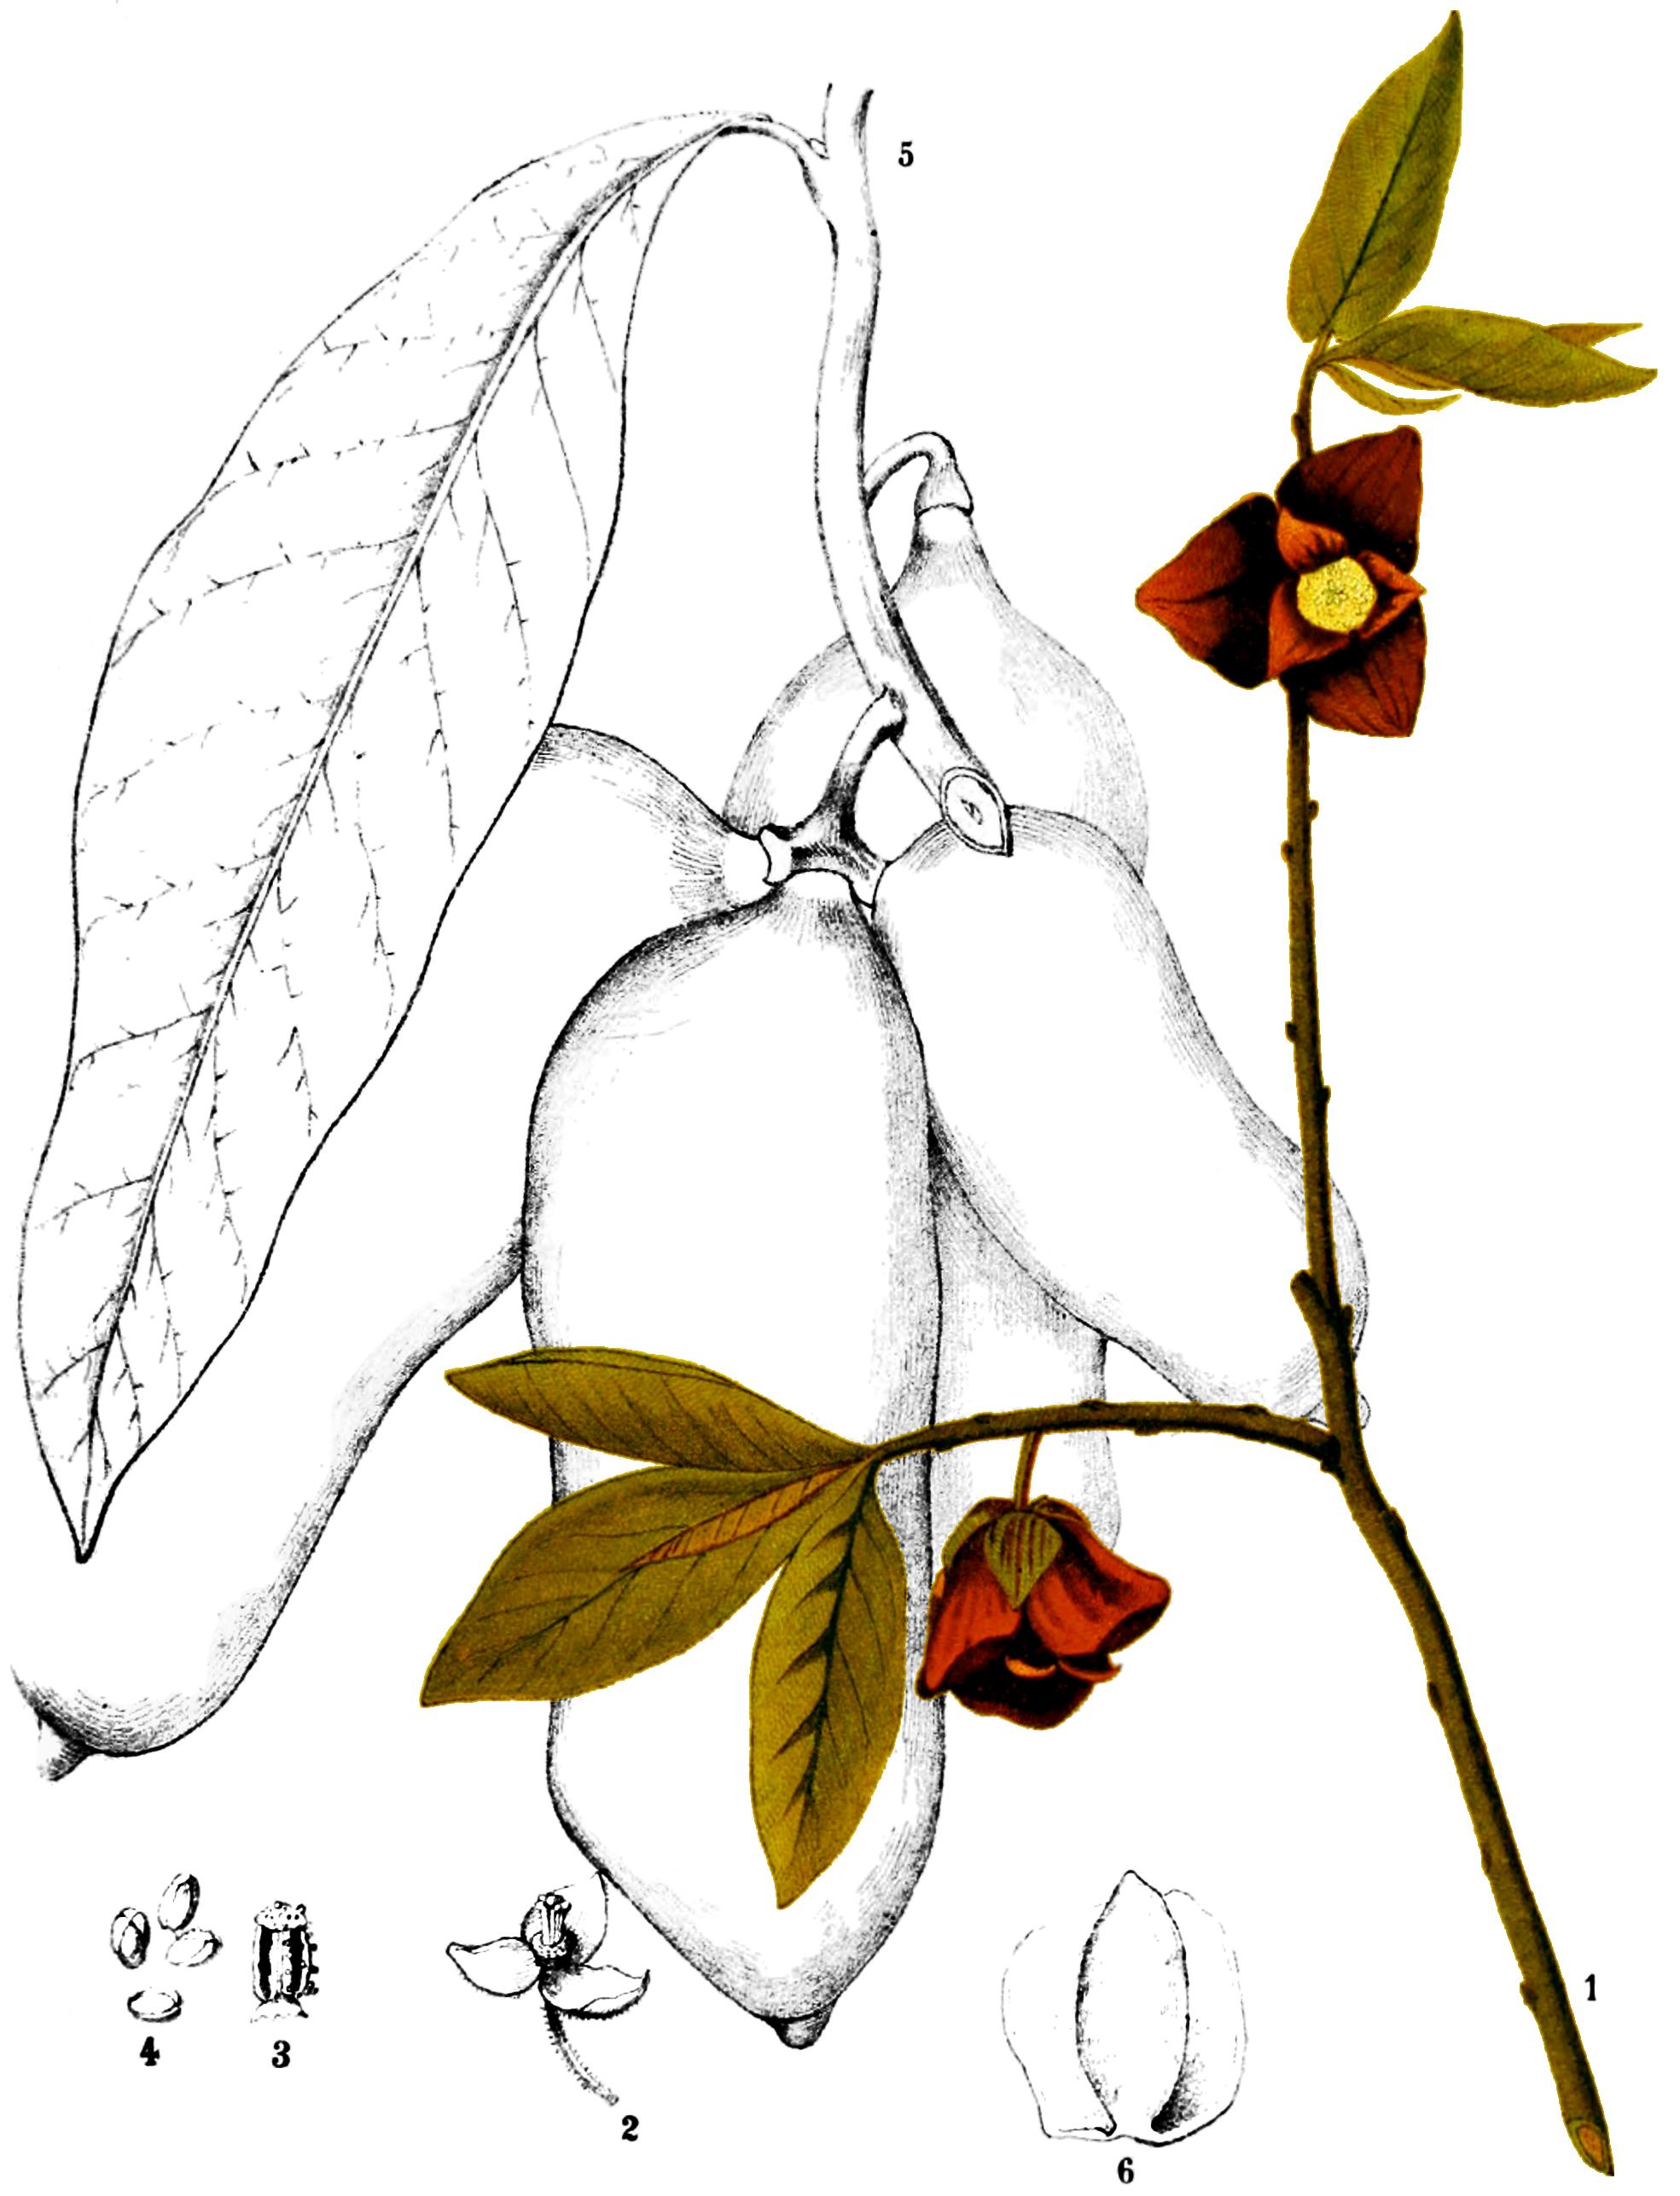 Asimina triloba Charles Frederick Millspaugh [Public domain], via Wikimedia Commons